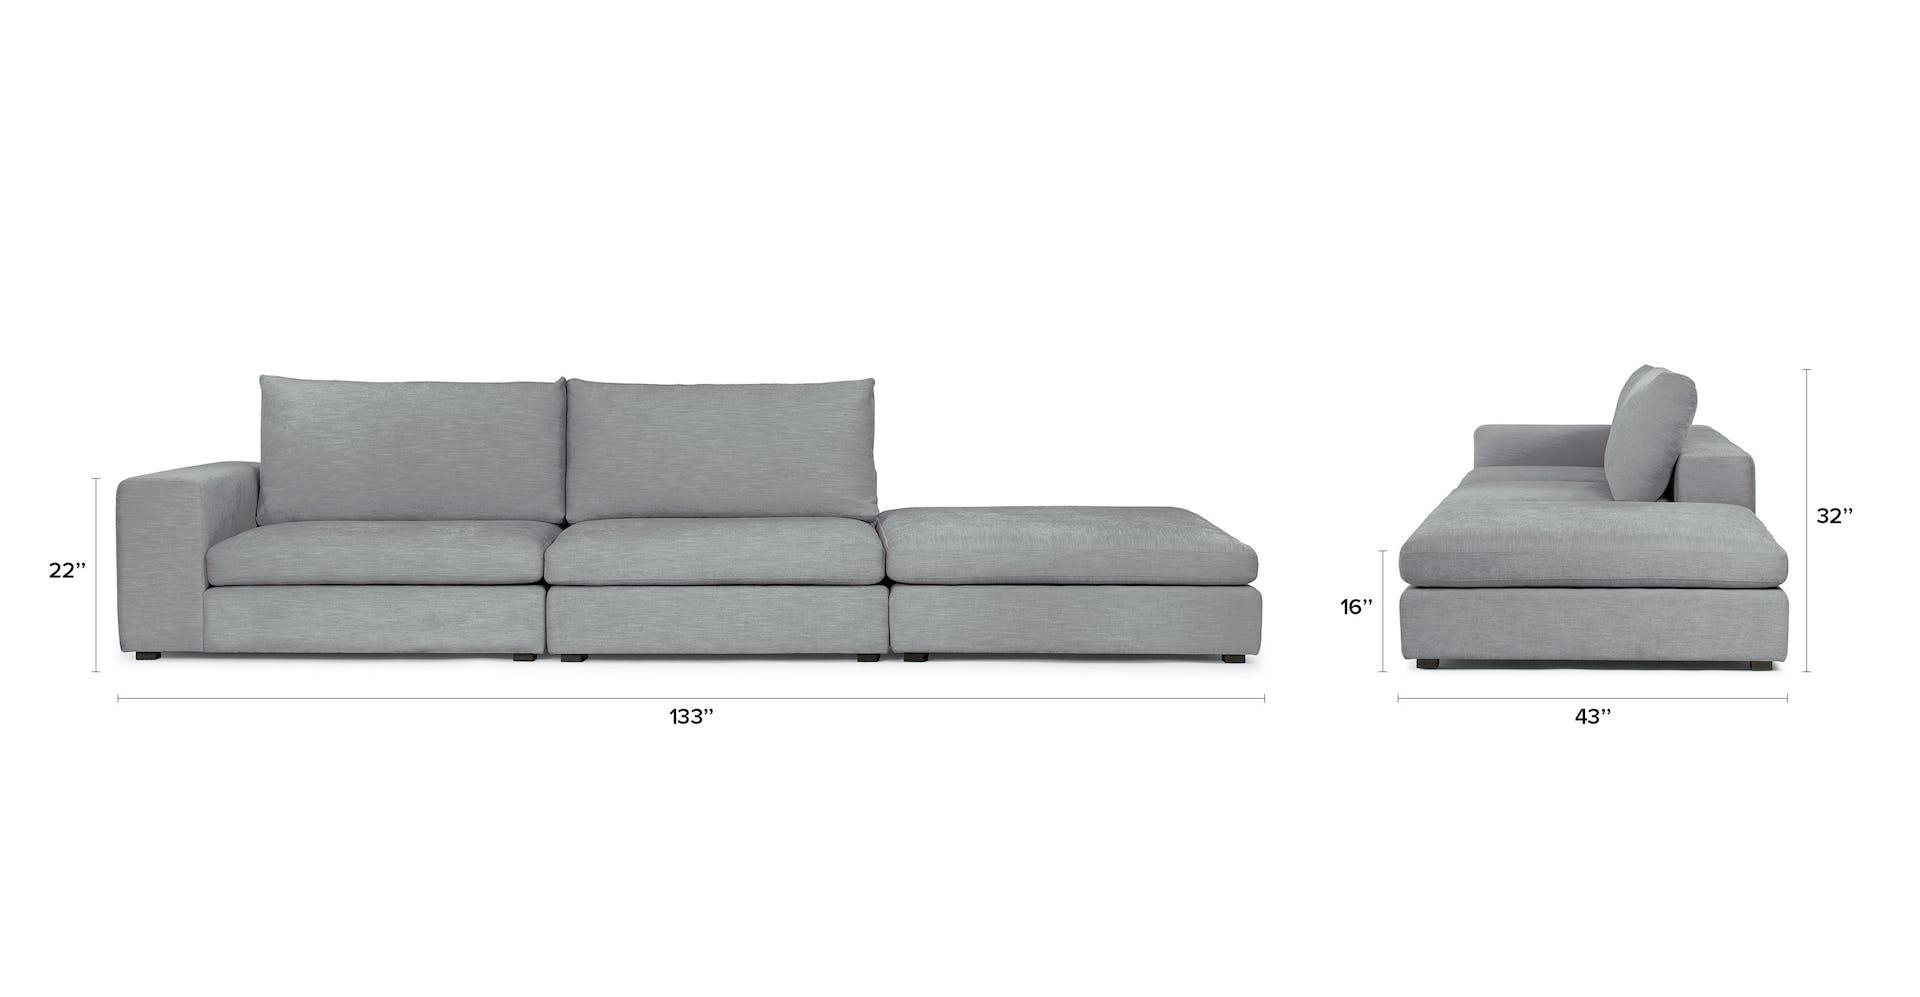 Gaba Gull Gray Left Arm Modular Sofa